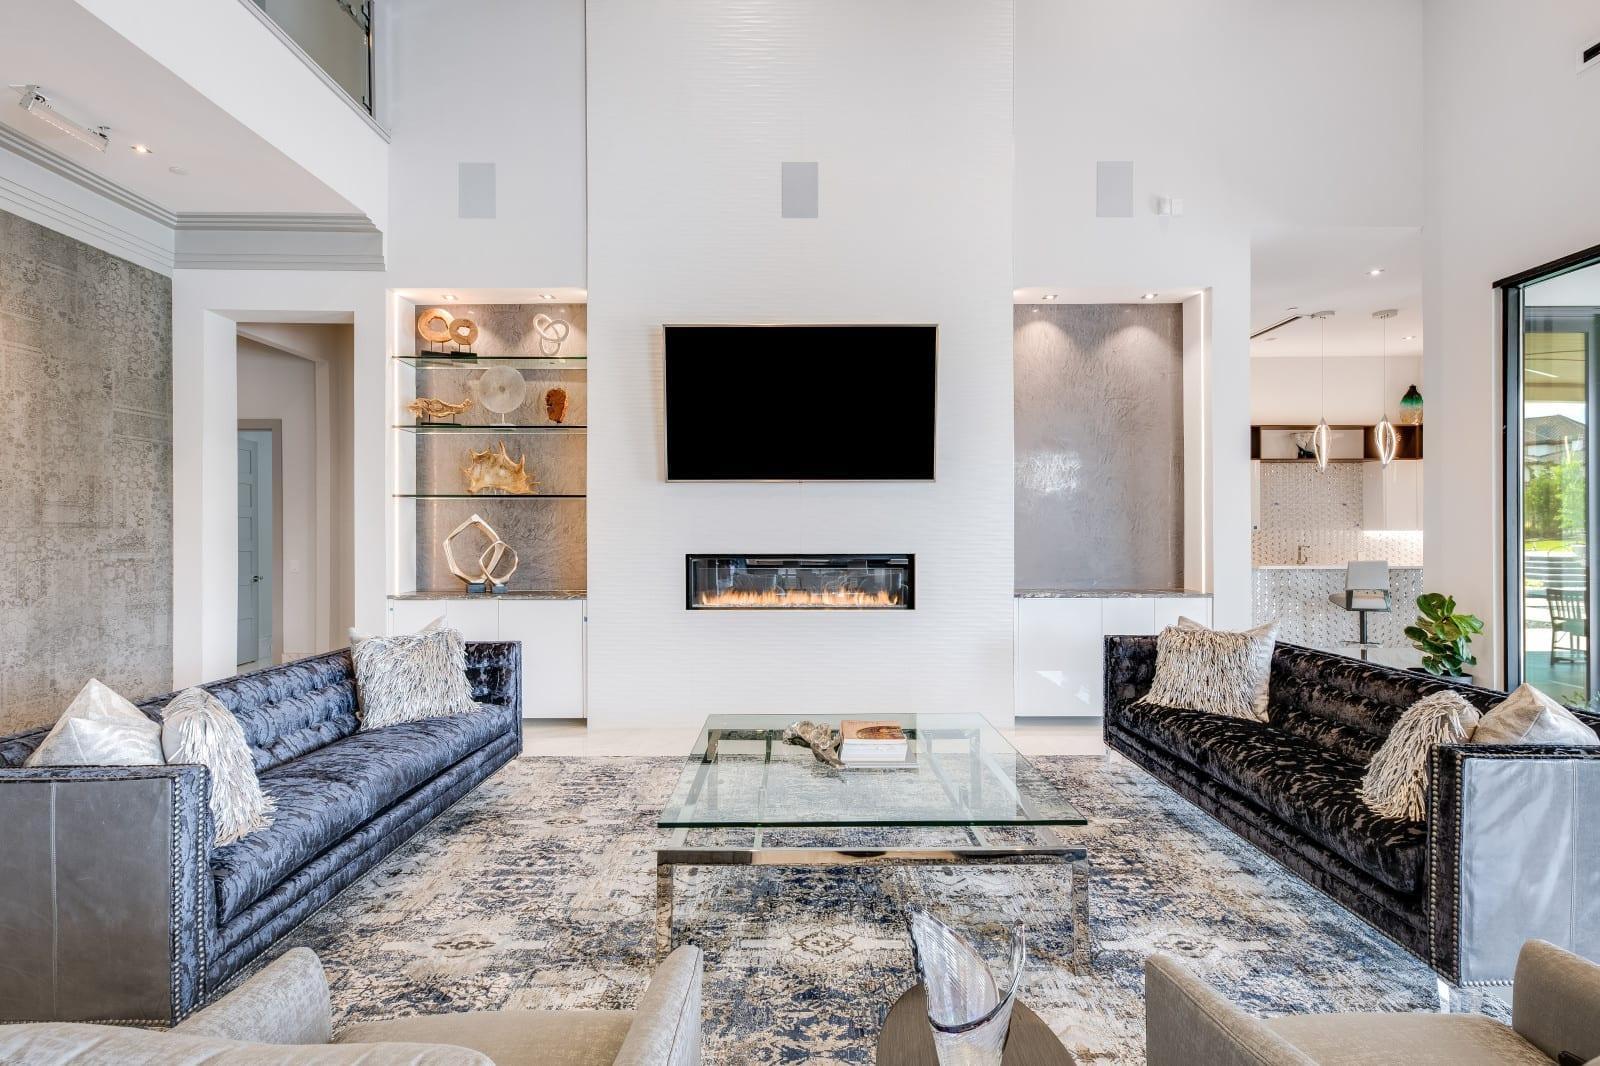 Custom Home Build and Interior Design # 9 - Millennial Design + Build, Custom Home Builders in Dallas Texas, modern style homes, Property Evaluator, Interior Designers, using BIM Technology and Home 3D Model.